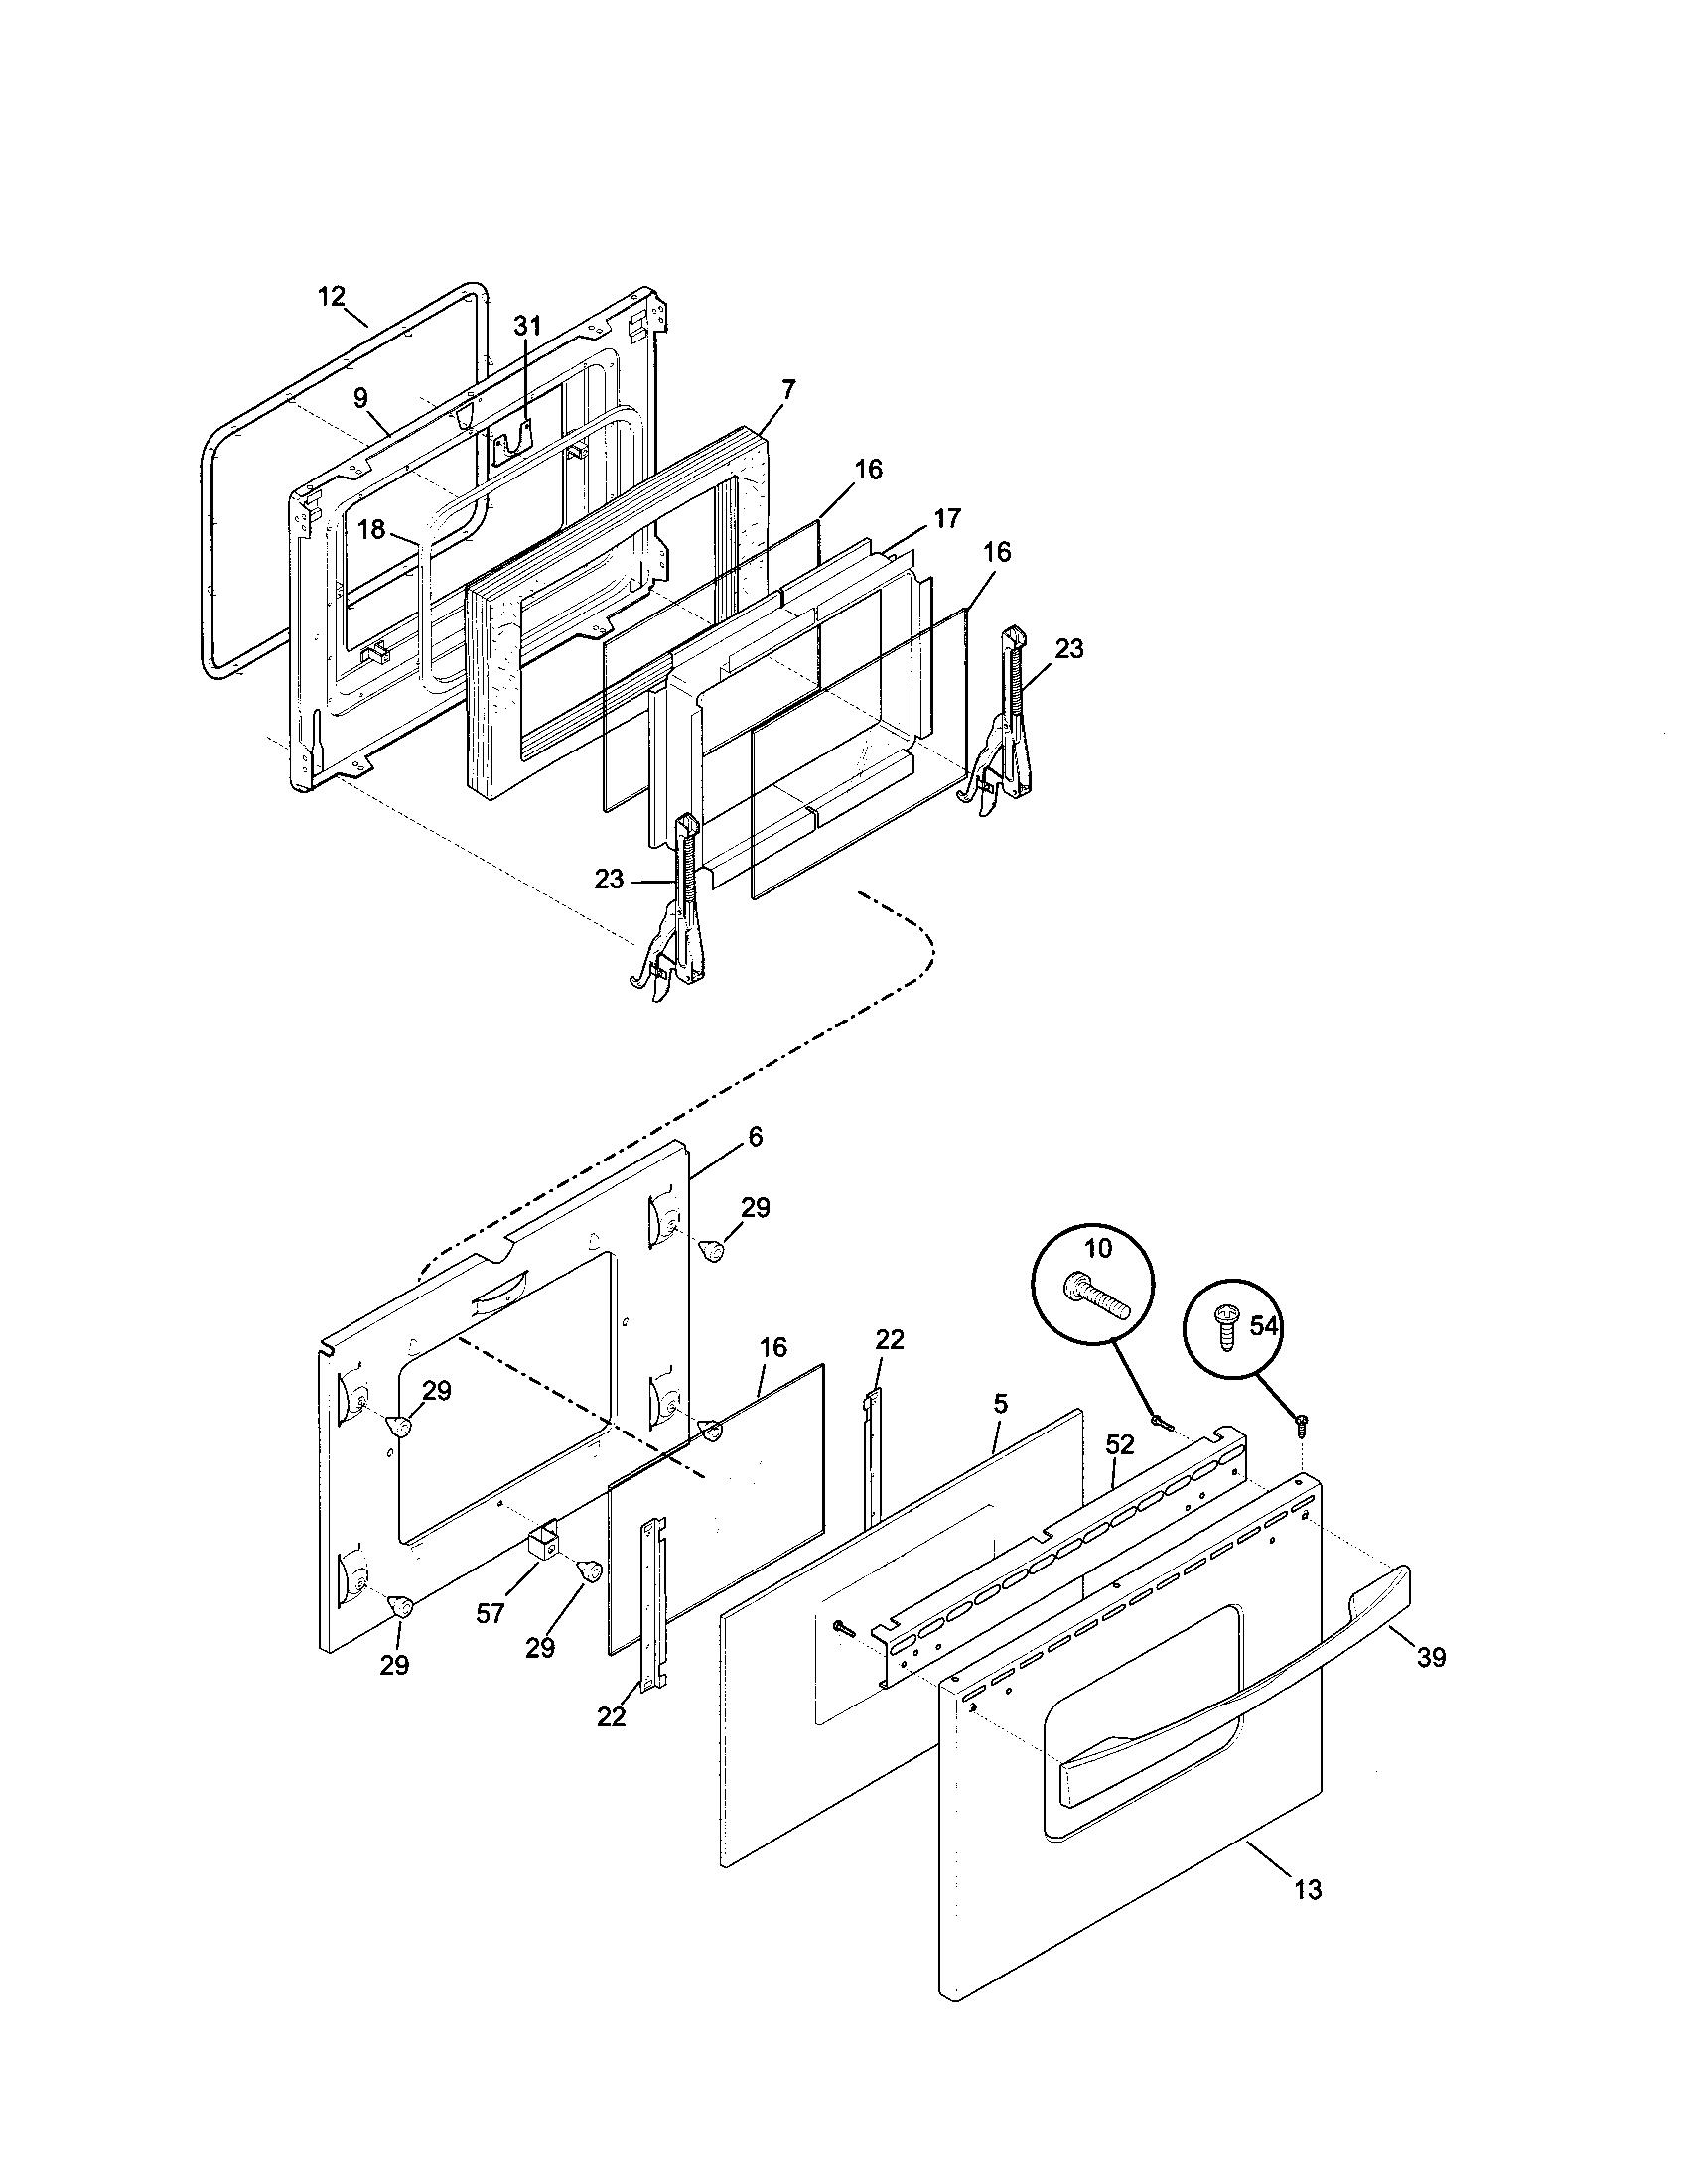 kenmore dishwasher 6651776 user guide signal wiring schematics for, Wiring diagram